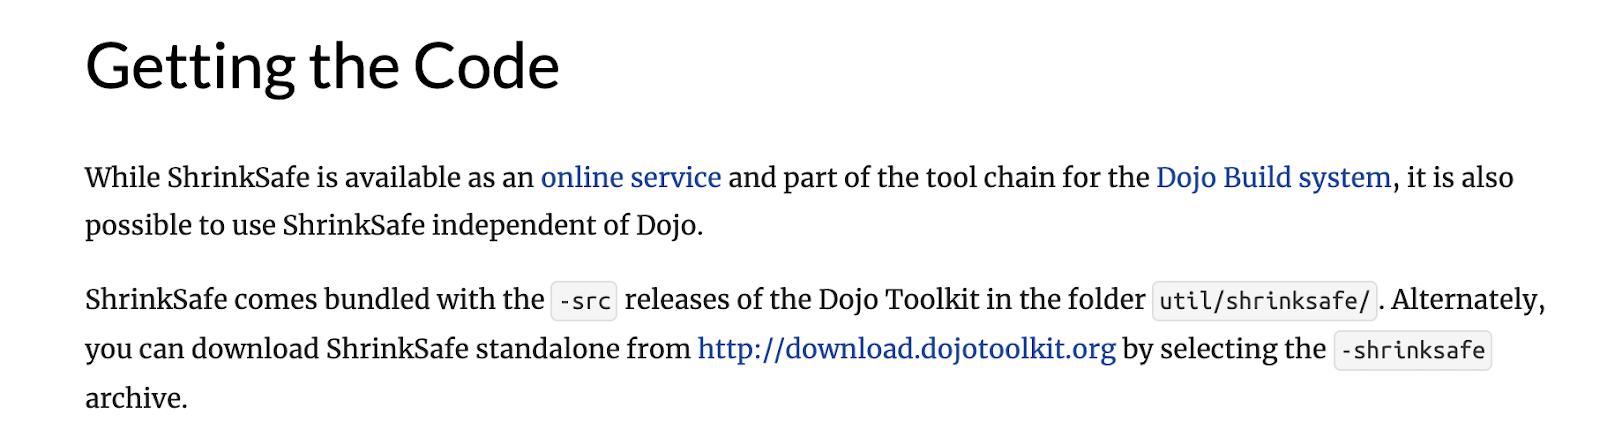 Dojo Shrinksafe screenshot javascript minification tools for eCommerce sites